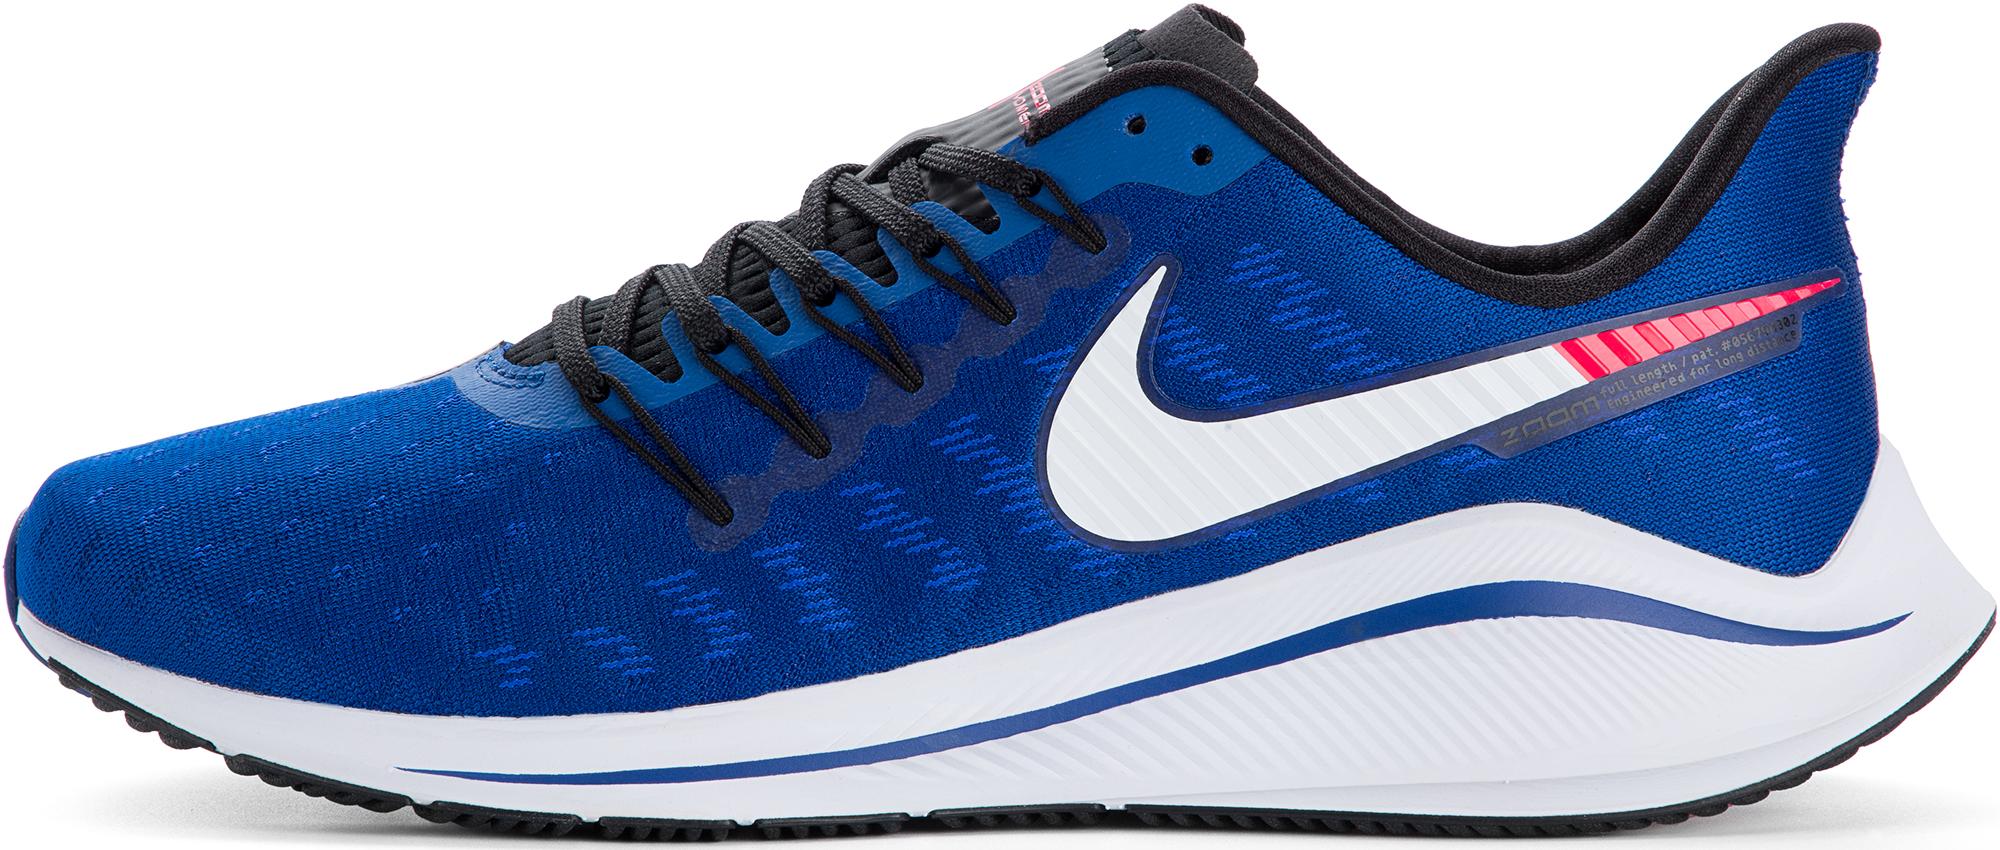 Nike Кроссовки мужские Air Zoom Vomero 14, размер 41,5